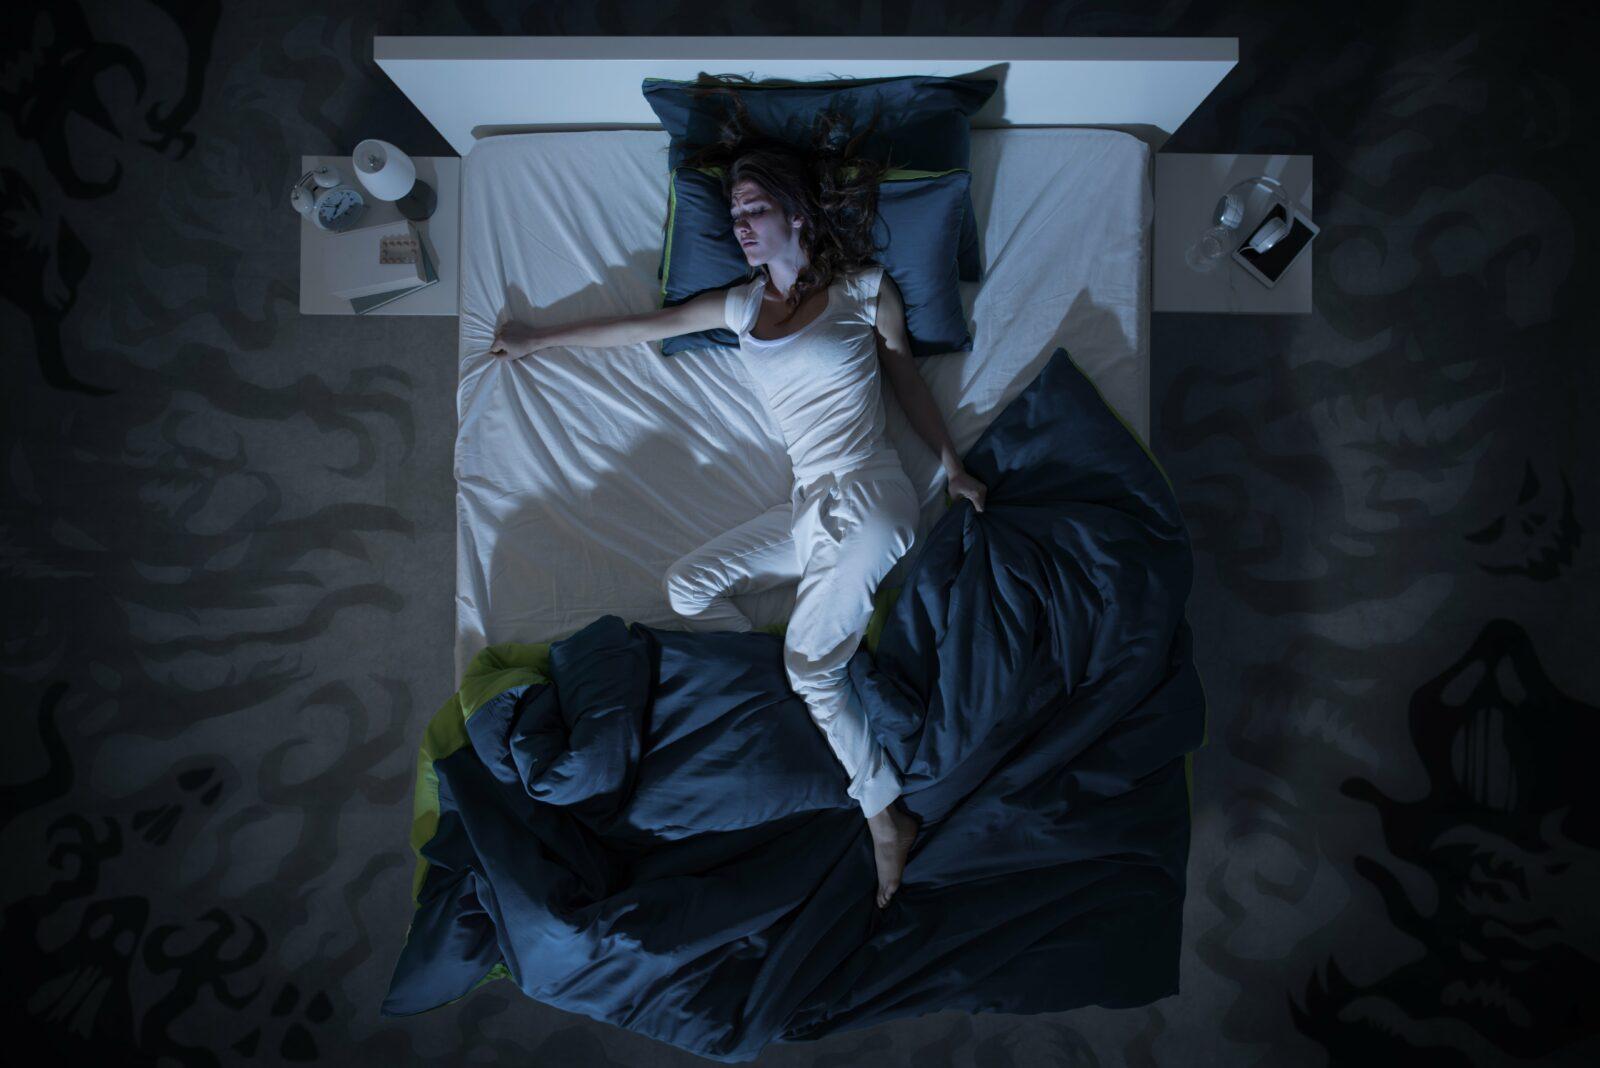 woman restlessly sleeping